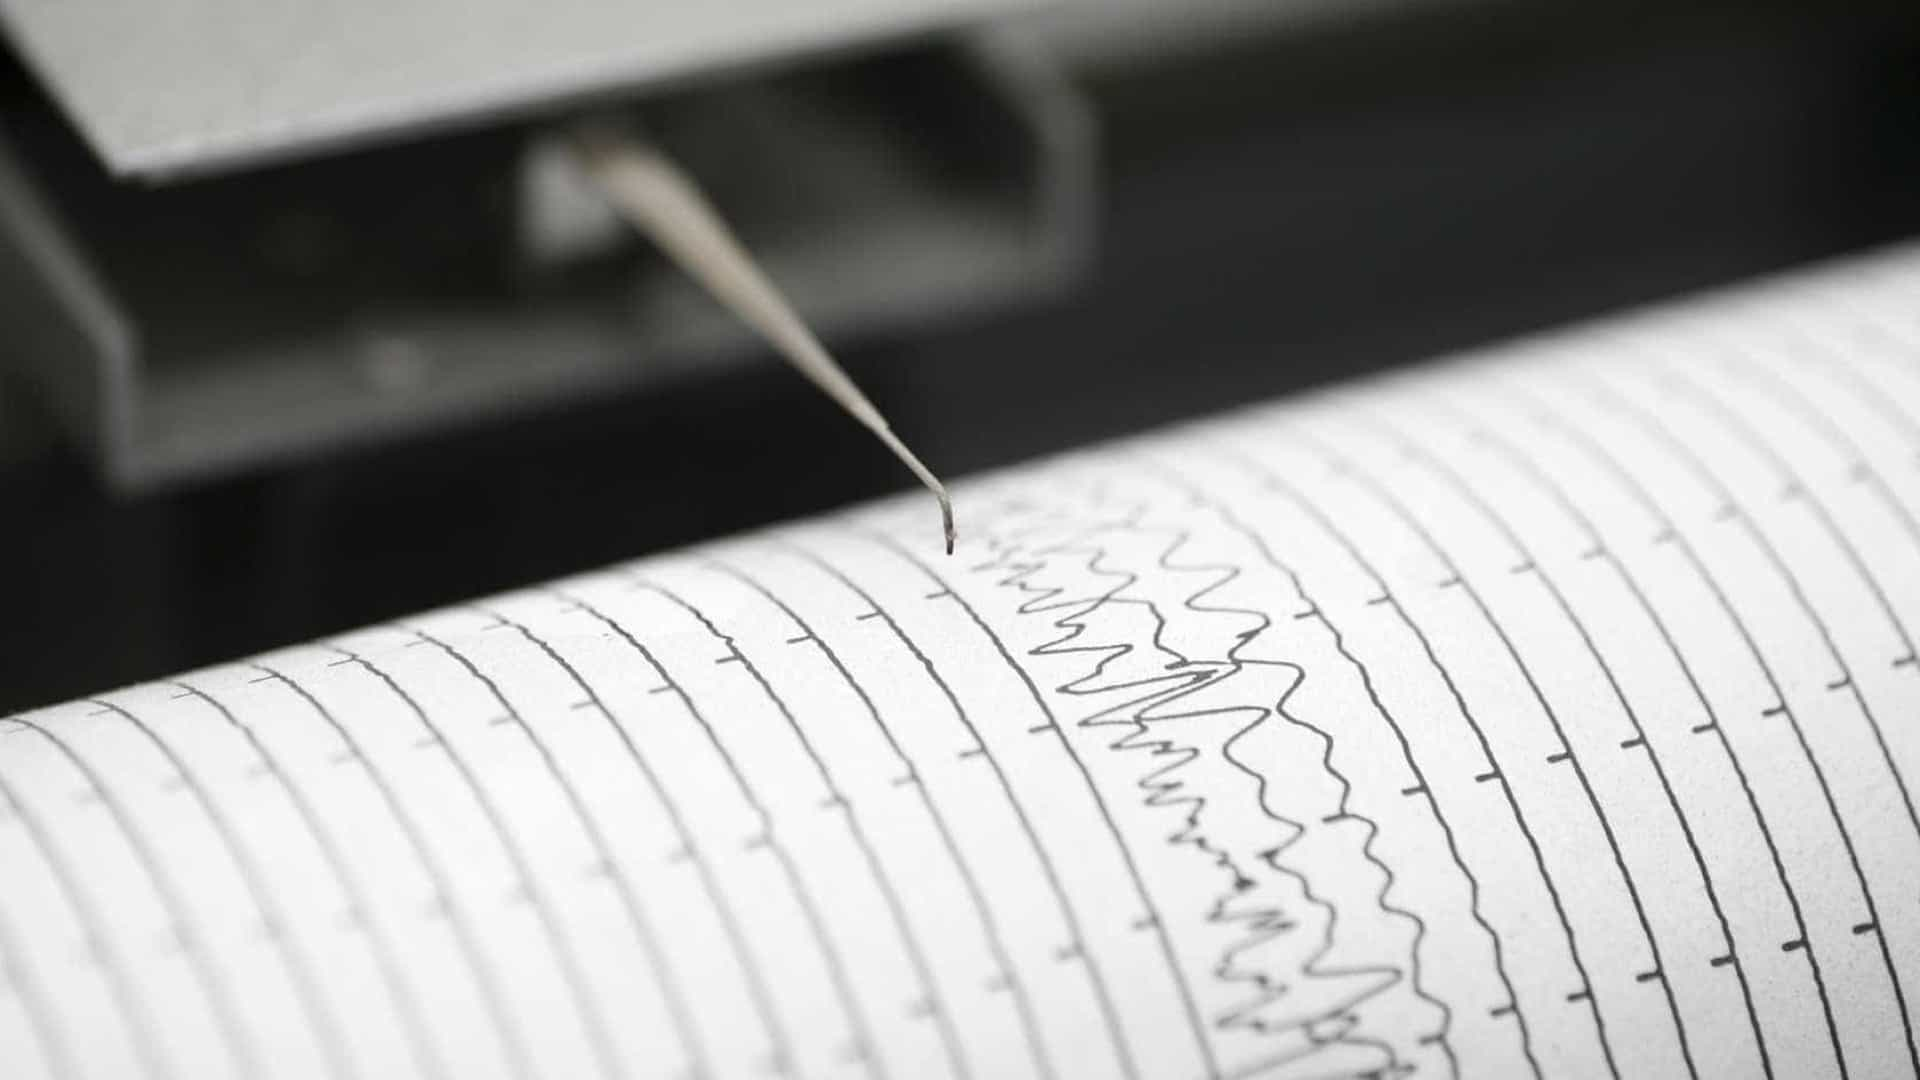 Levantado alerta de tsunami após sismo de 7.7 ao largo da Rússia